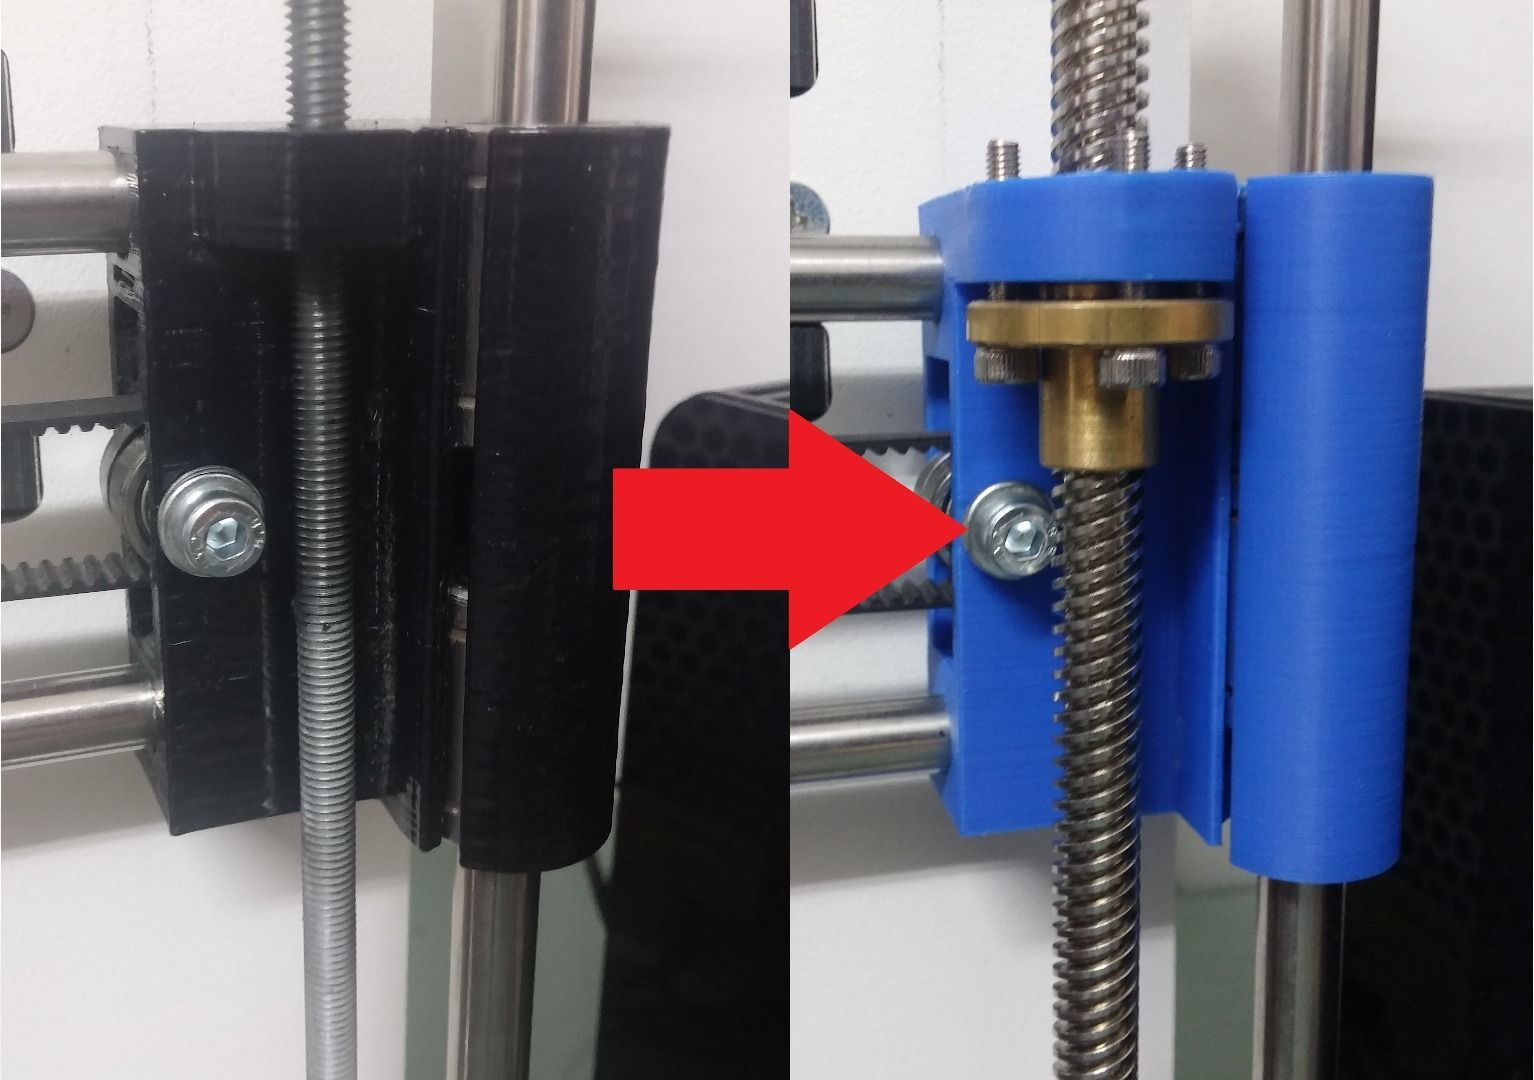 3D Printer Lead Screw Upgrade | CNC | 3d printer, Printer, 3d